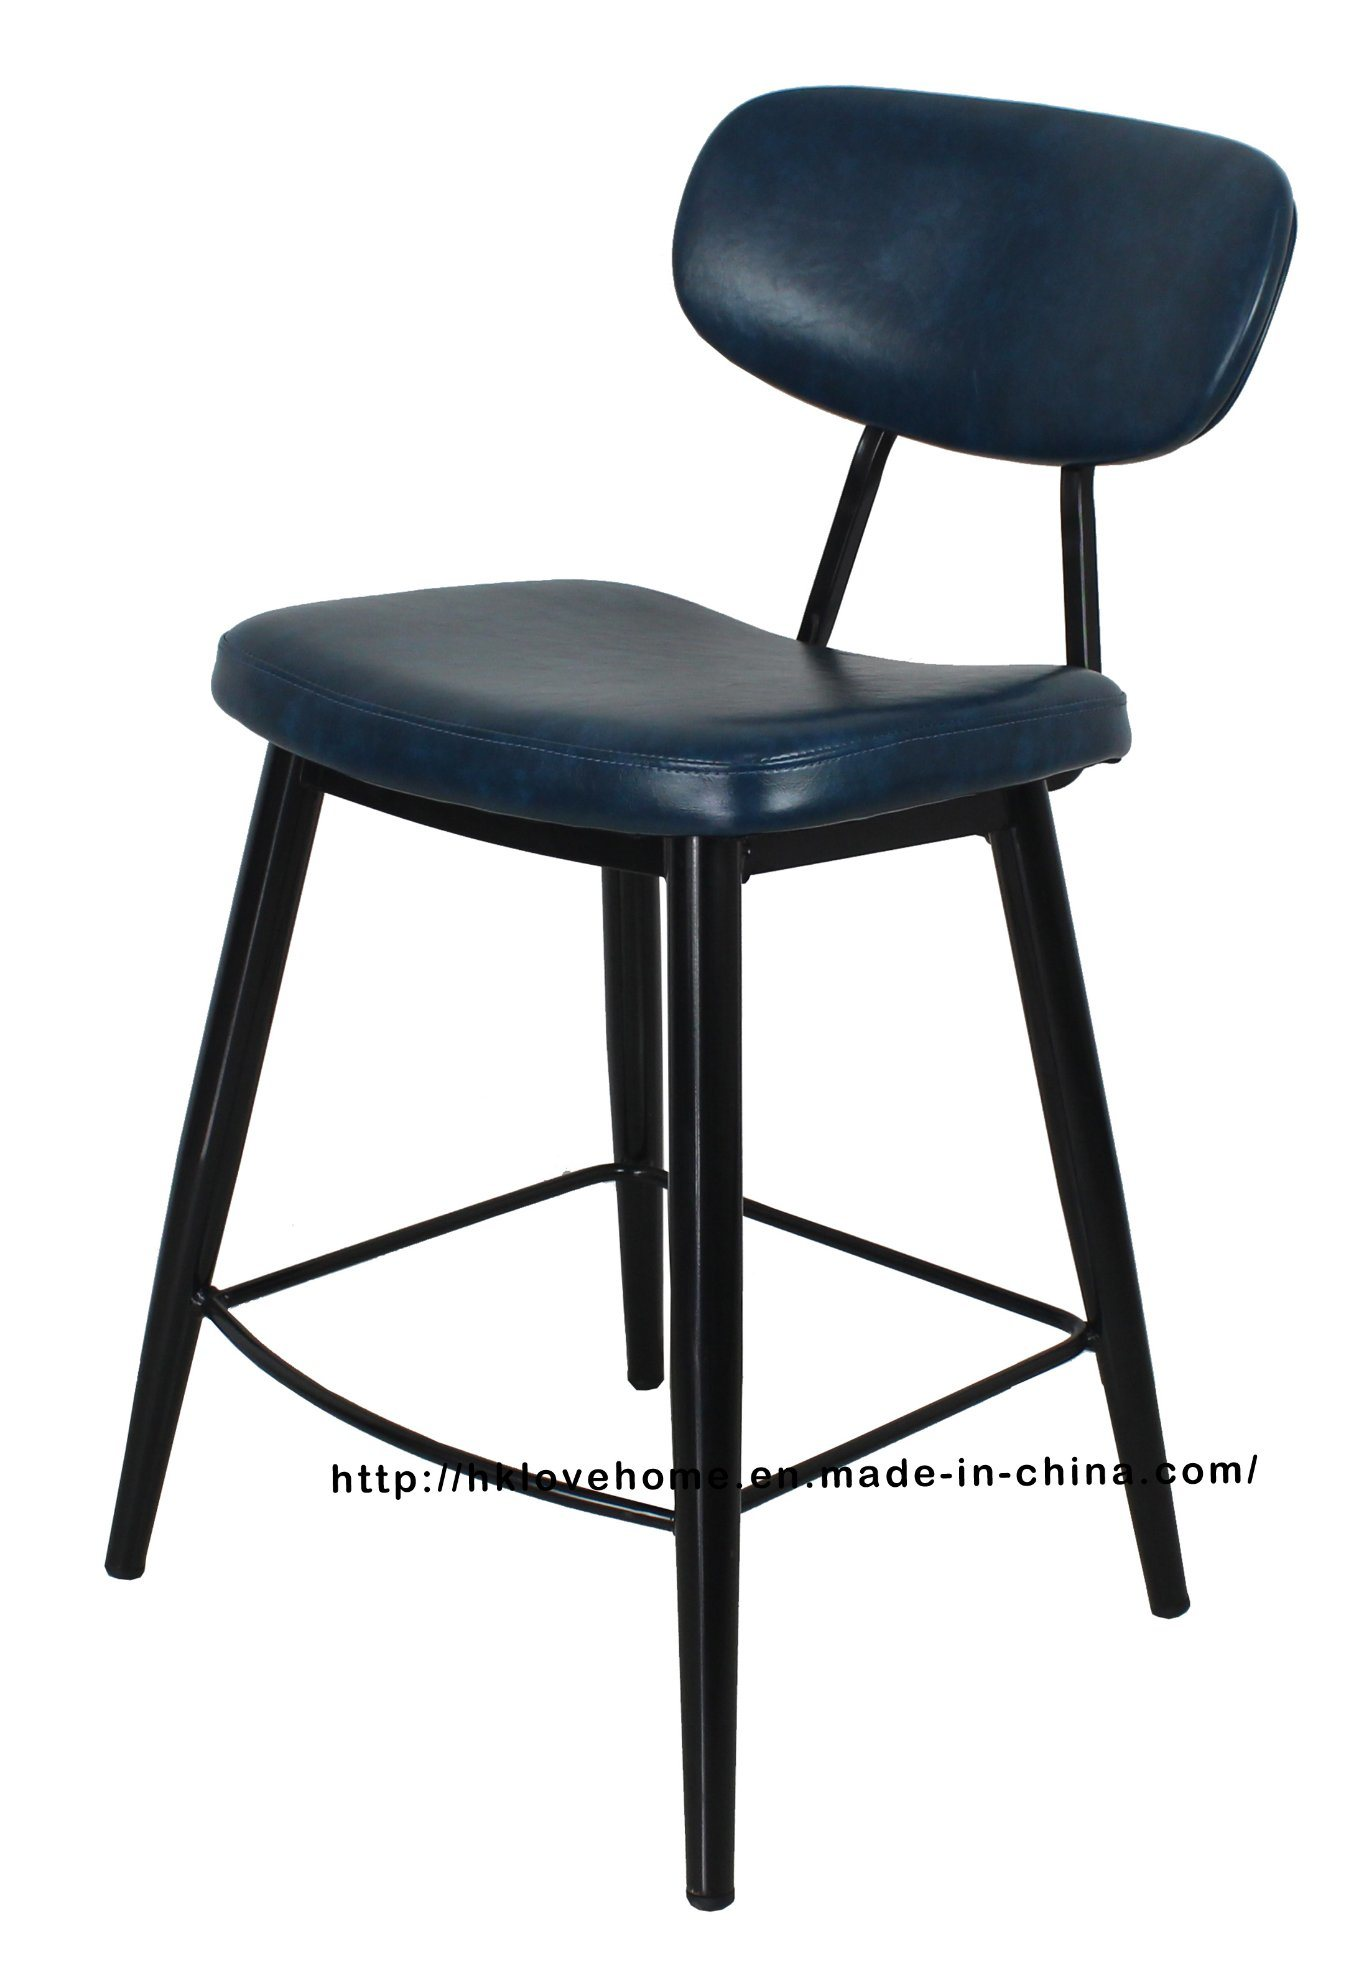 Groovy Hot Item Replica Restaurant Furniture Pu Copine Sean Dix Counter Bar Chairs Unemploymentrelief Wooden Chair Designs For Living Room Unemploymentrelieforg